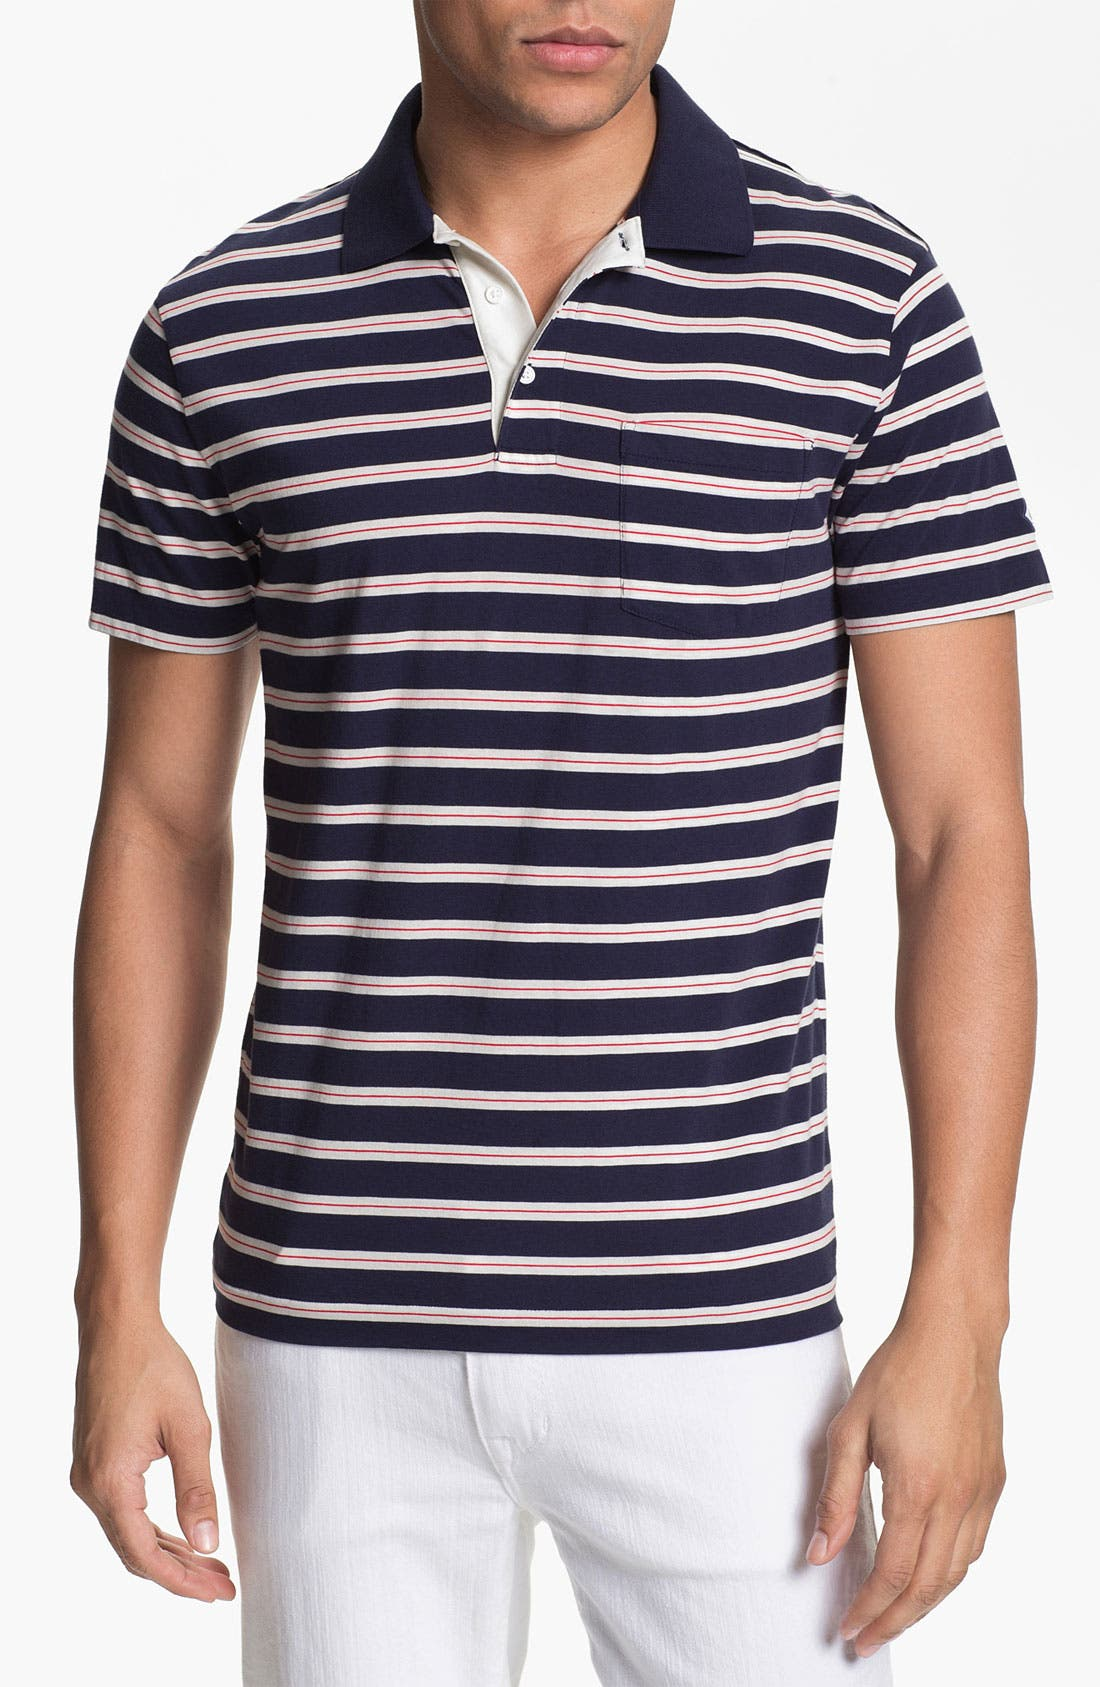 Main Image - Gant Rugger Stripe Jersey Polo